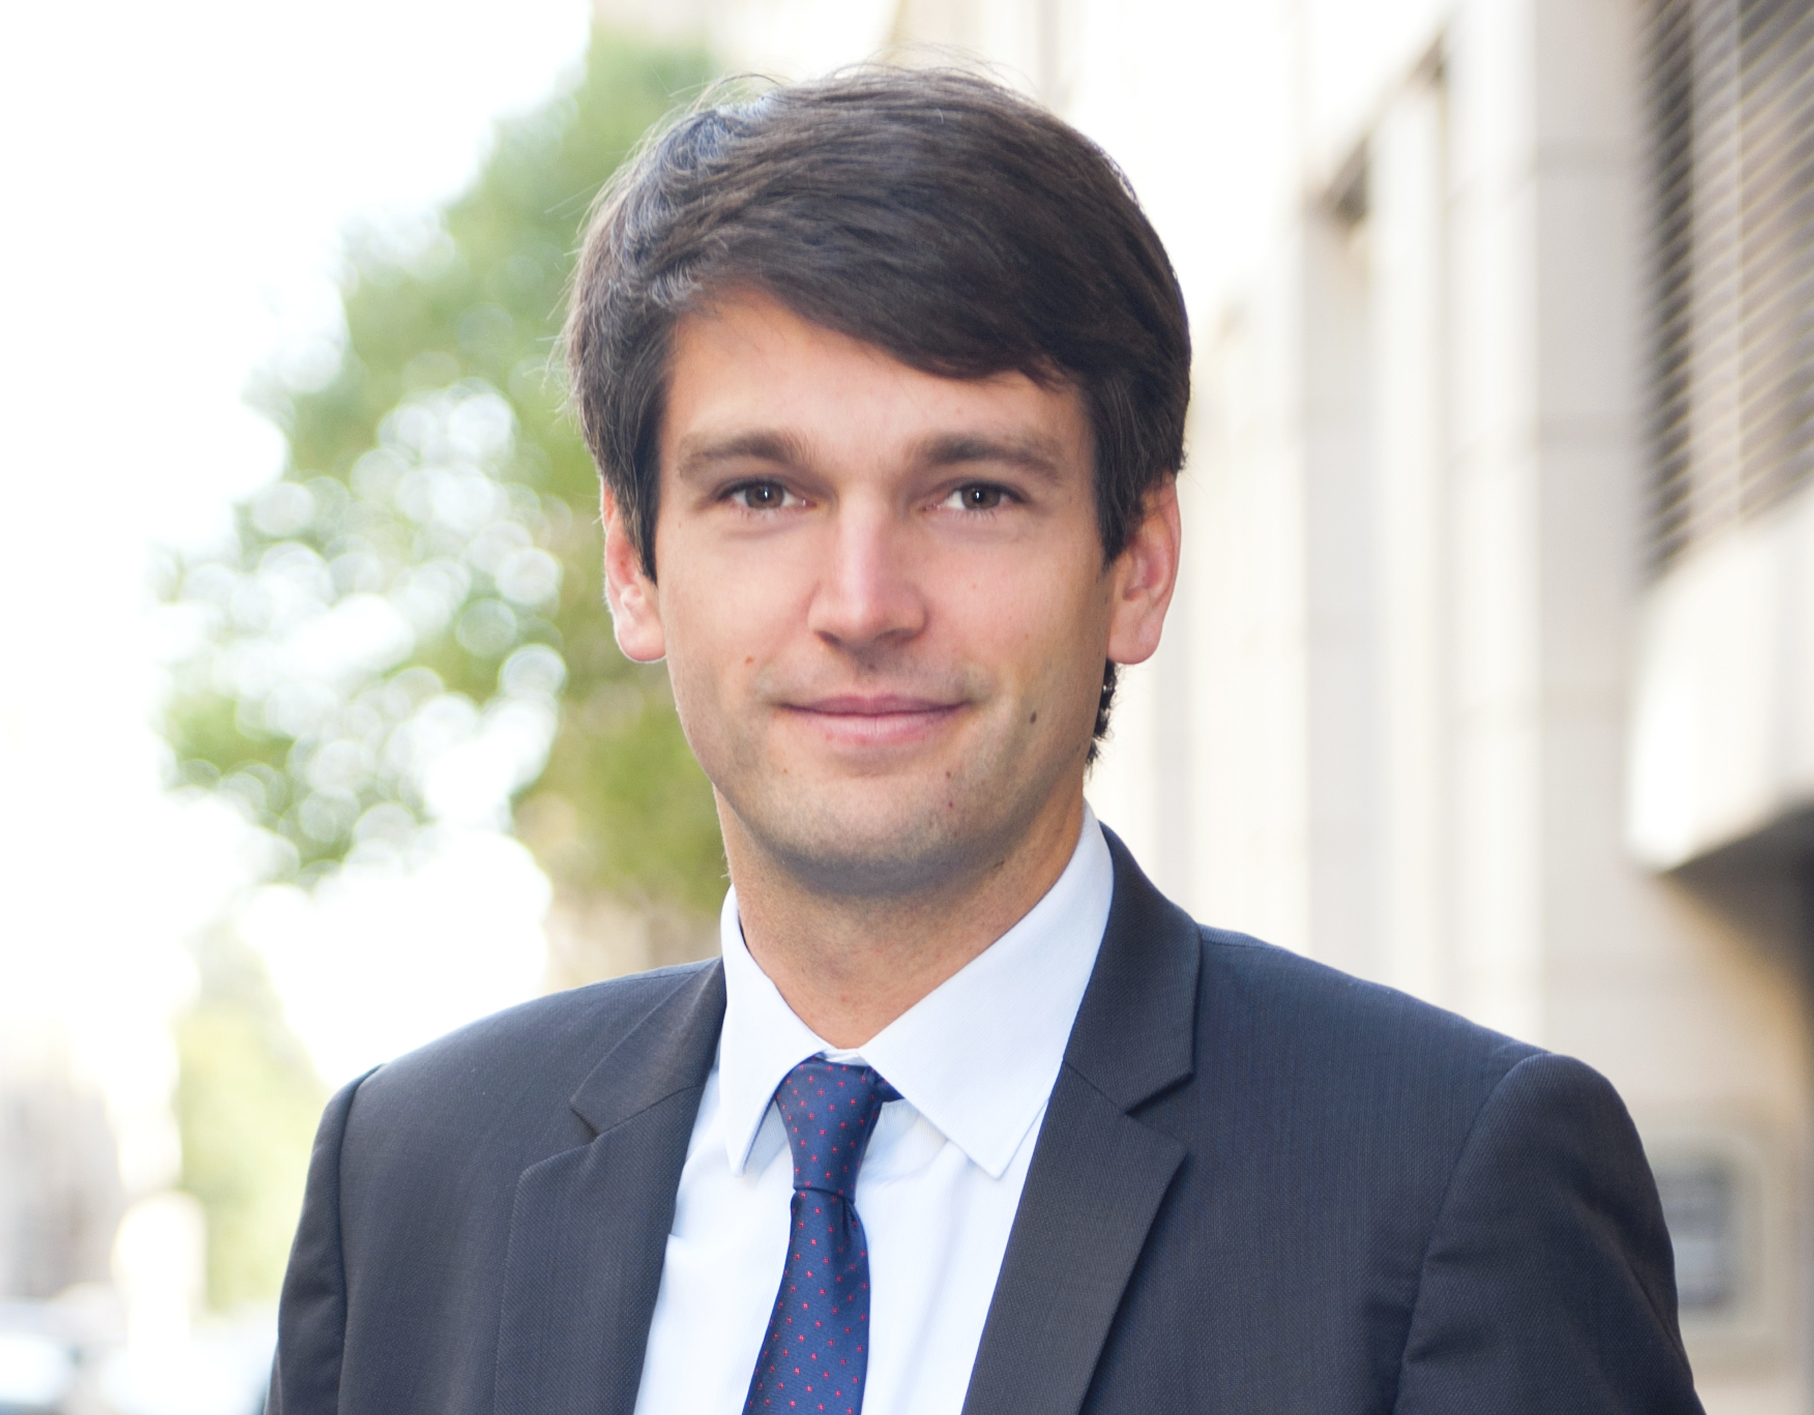 Thibaut Richard, IK Investment Partners